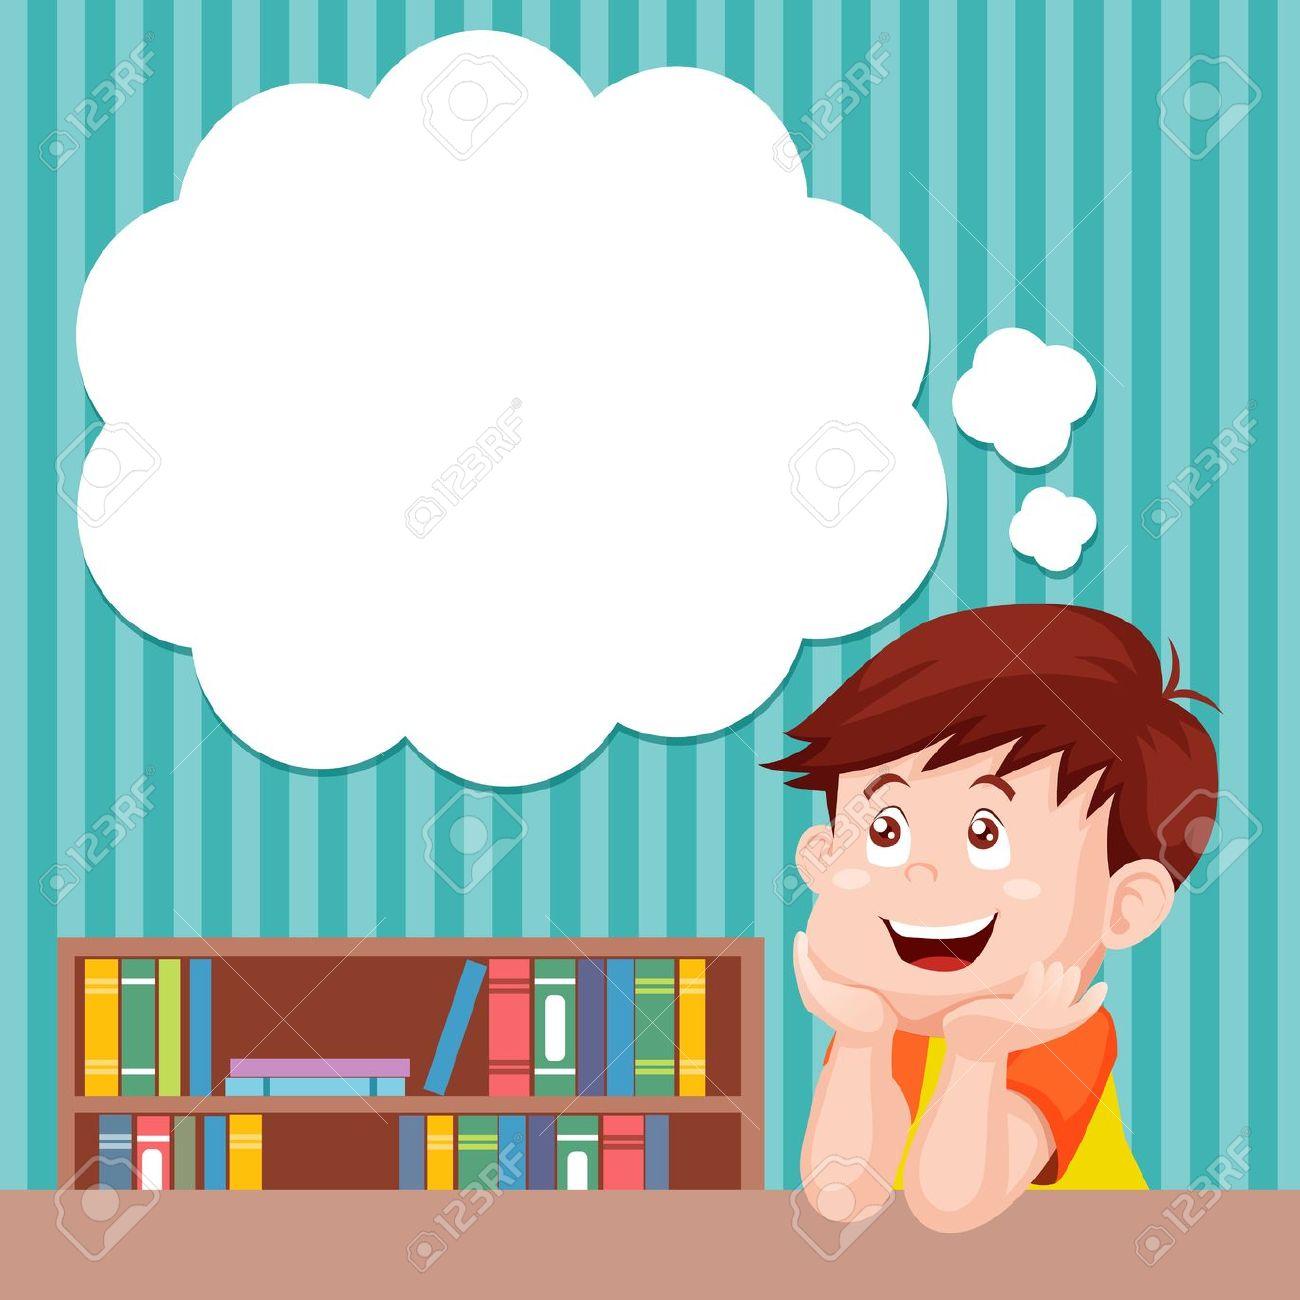 Animated boy thinking clipart